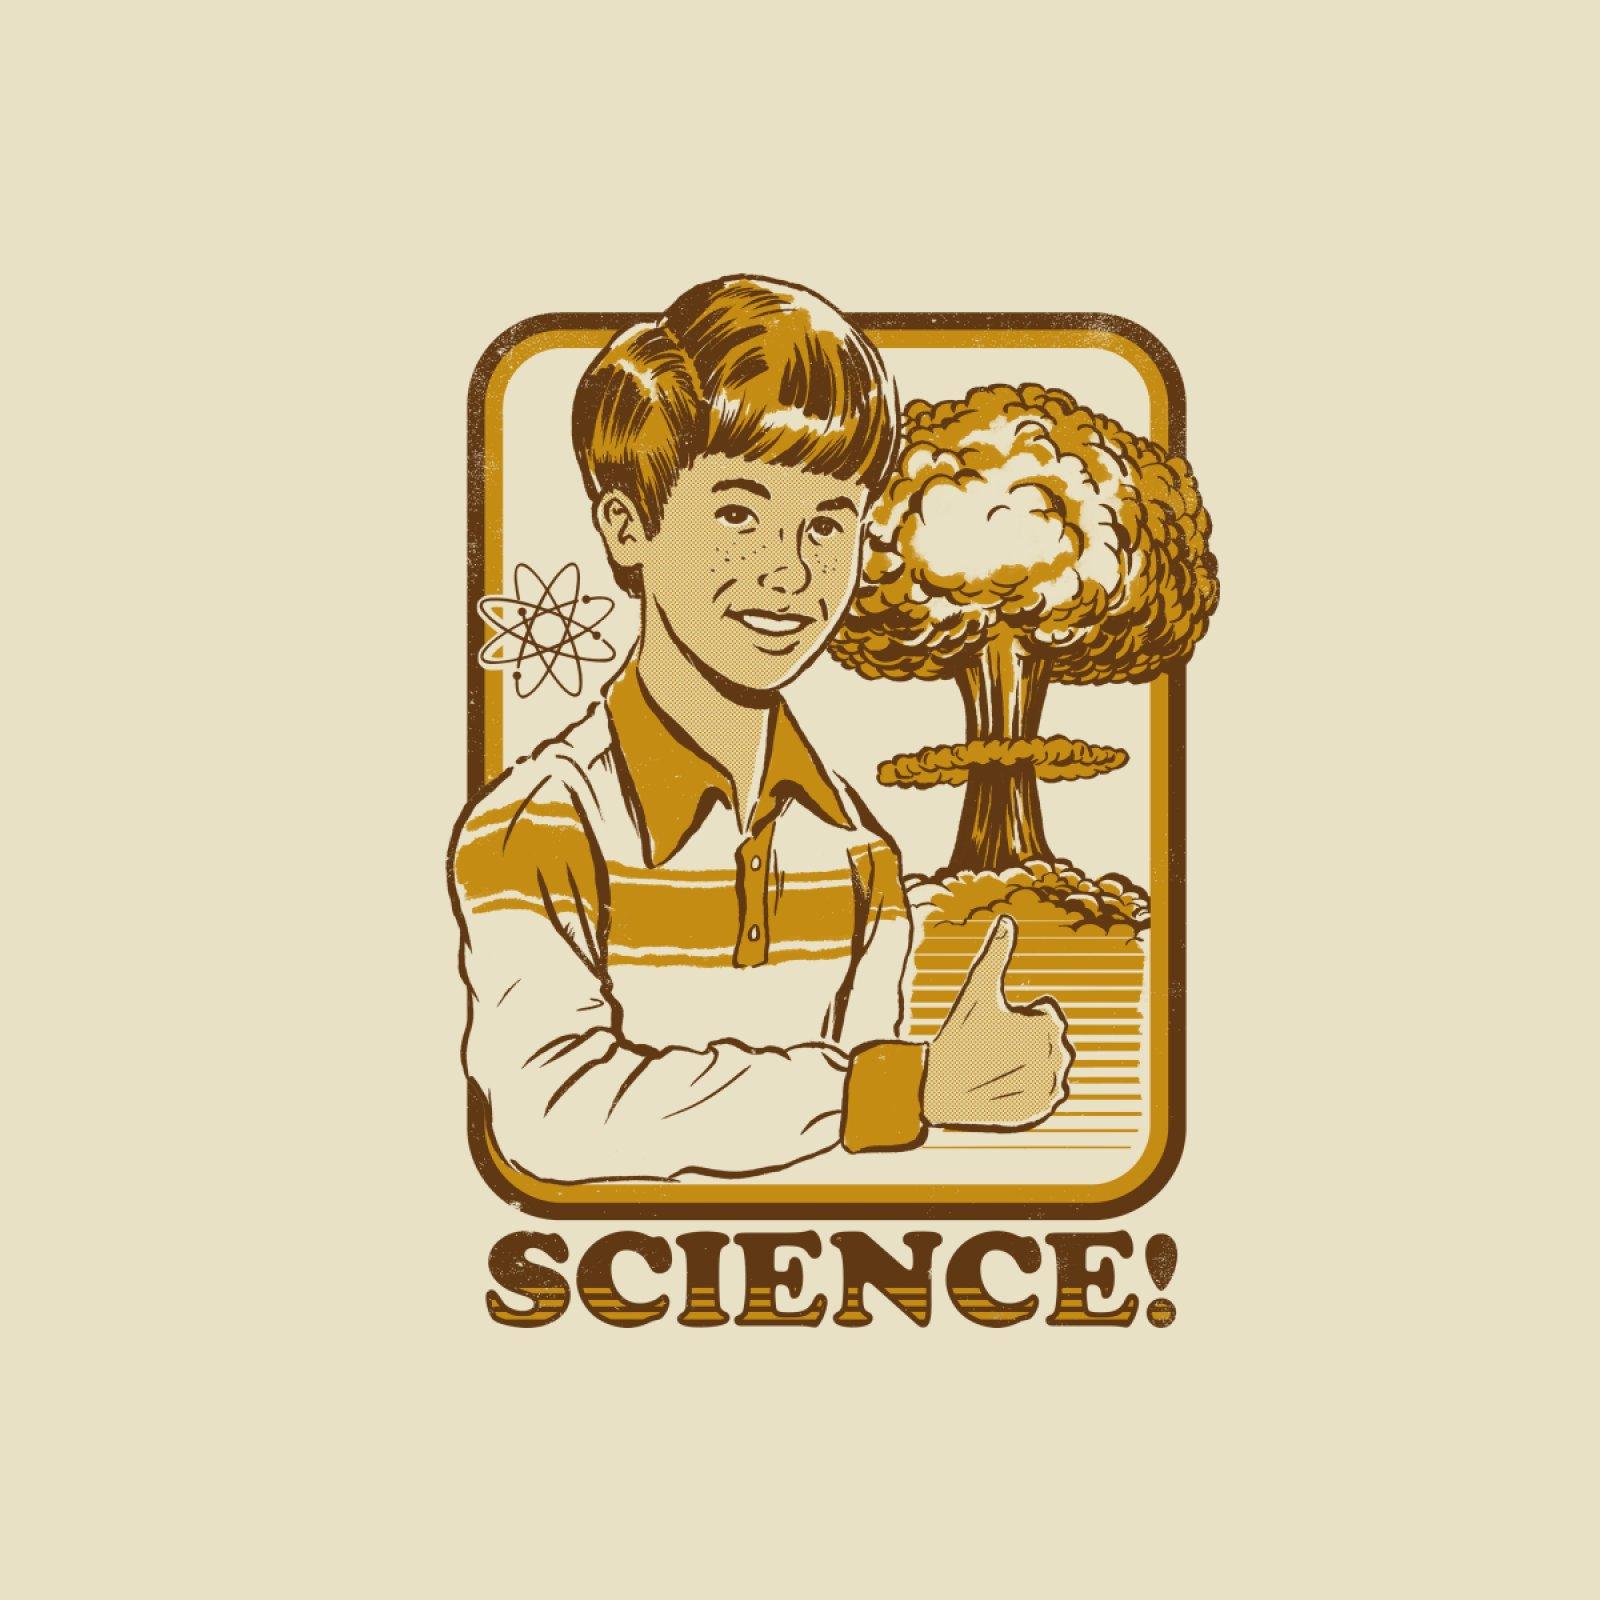 Science! Variant 2